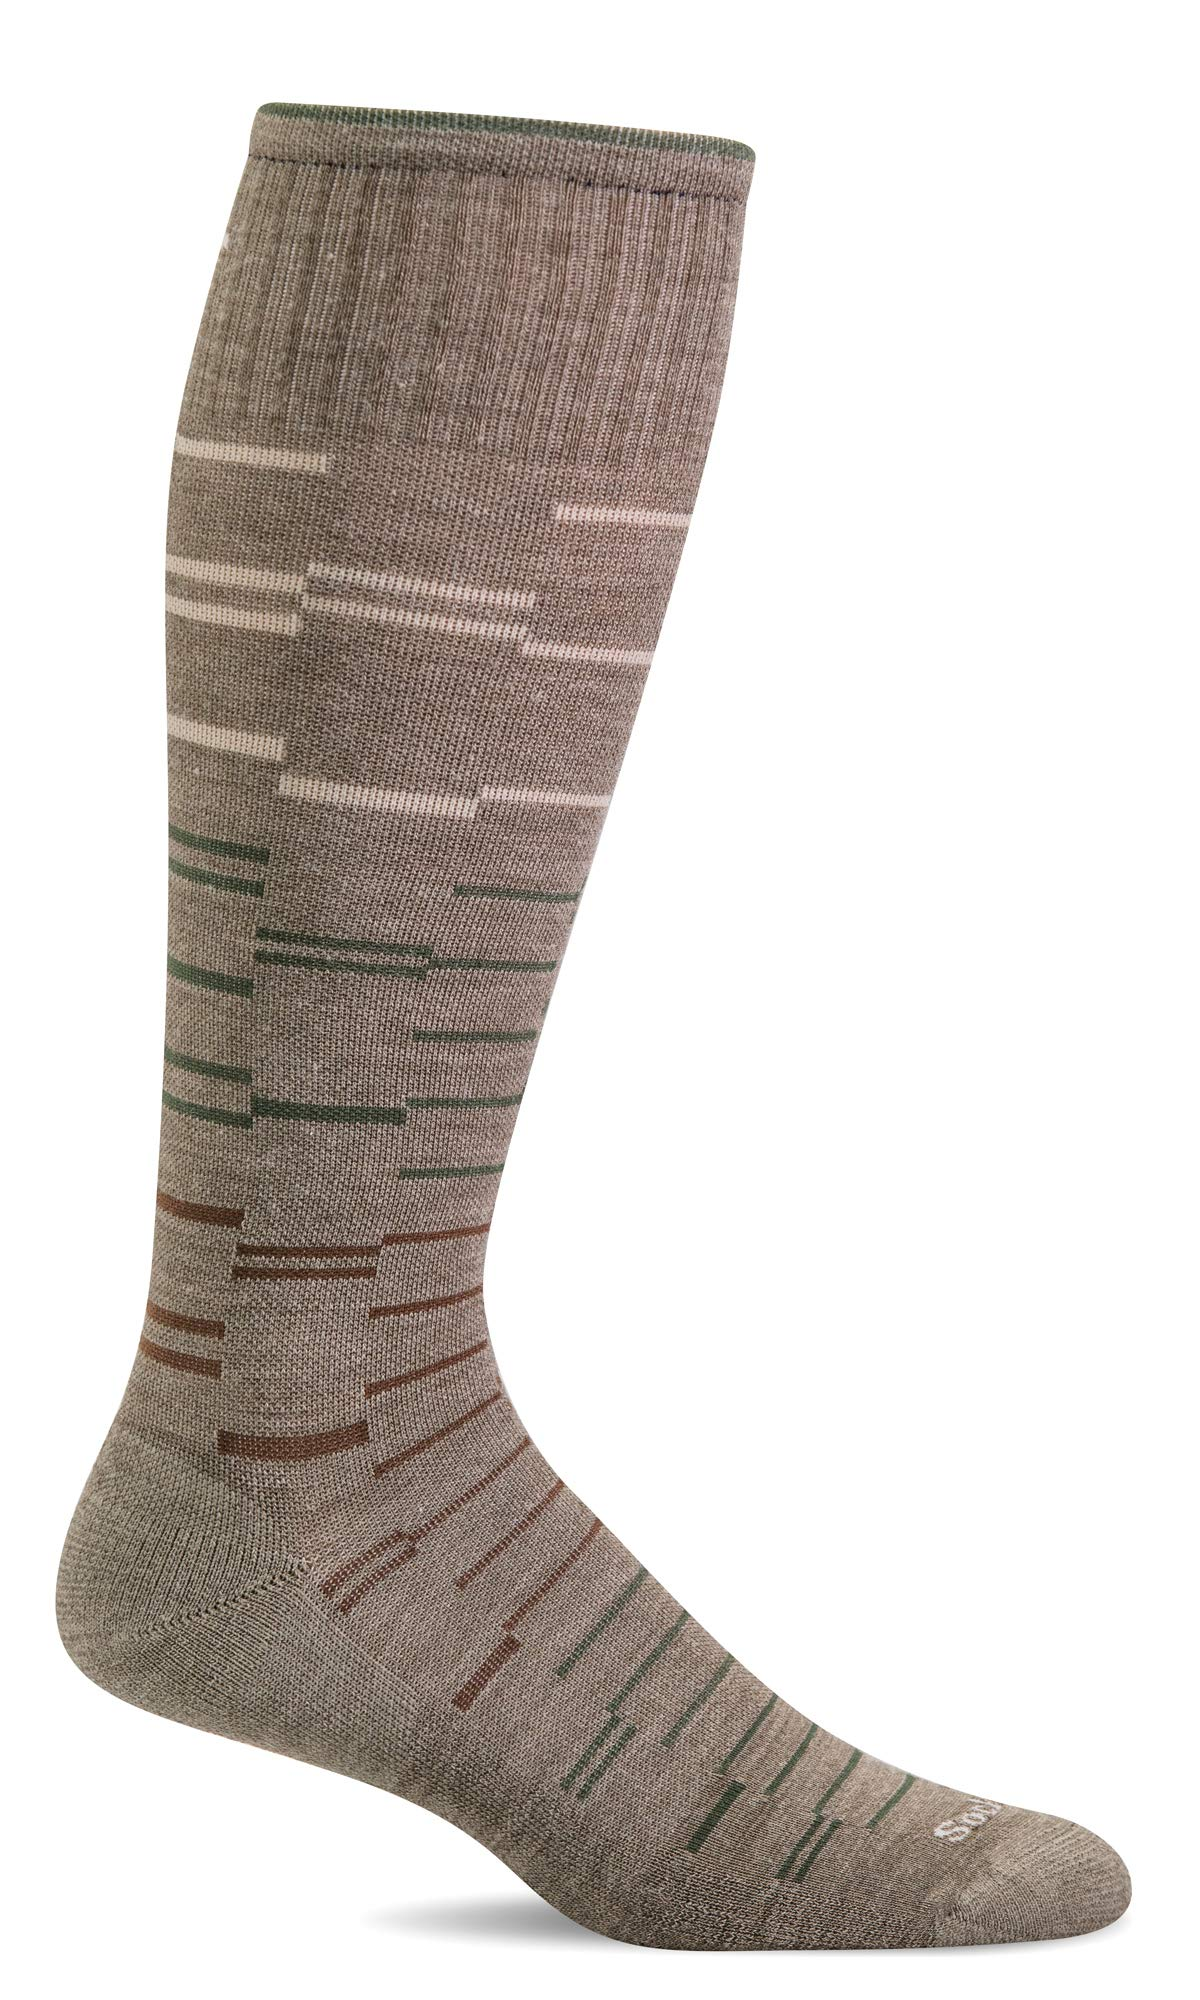 Sockwell Men's Dashing Moderate Graduated Compression Sock, Khaki - L/XL by Sockwell